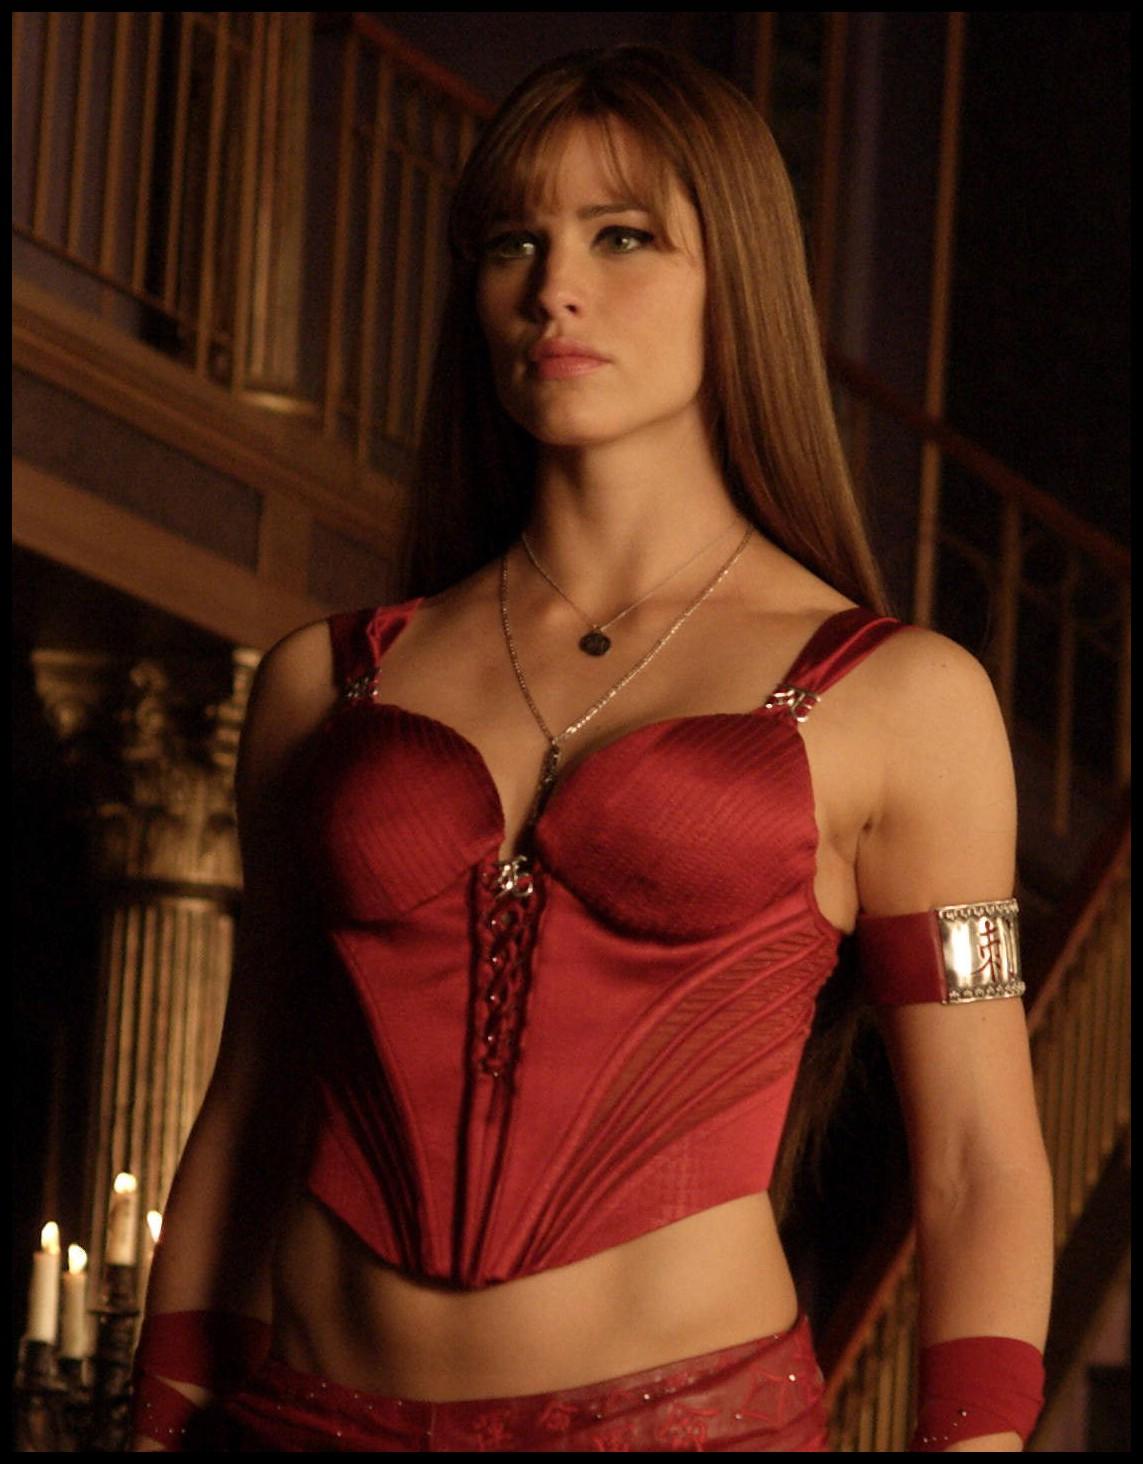 Jennifer garner elektra bikini amp cleavage scenes